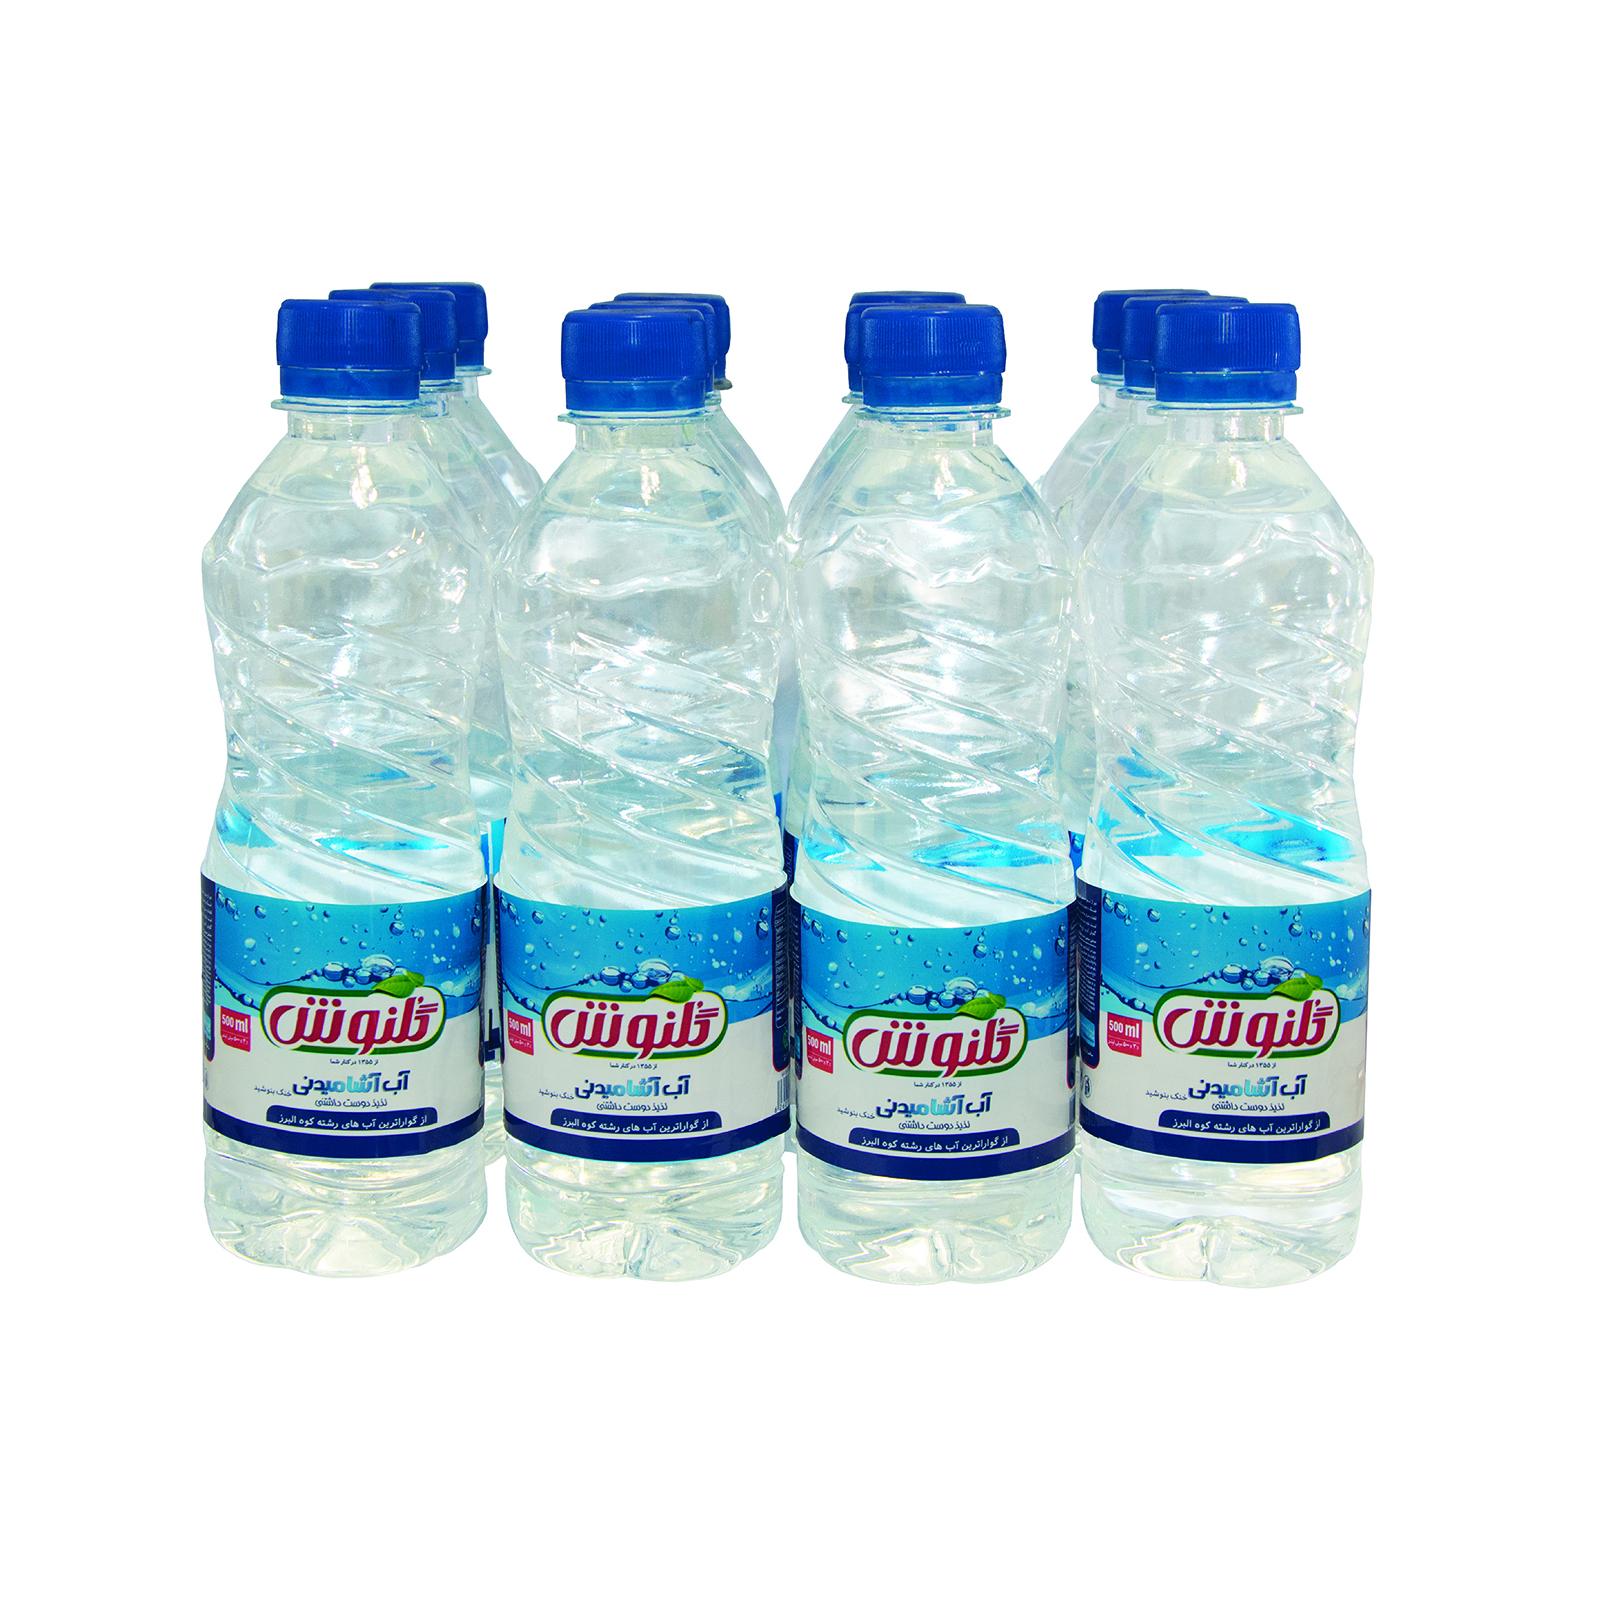 آب آشامیدنی گلنوش - 0.5 لیتر بسته 12 عددی